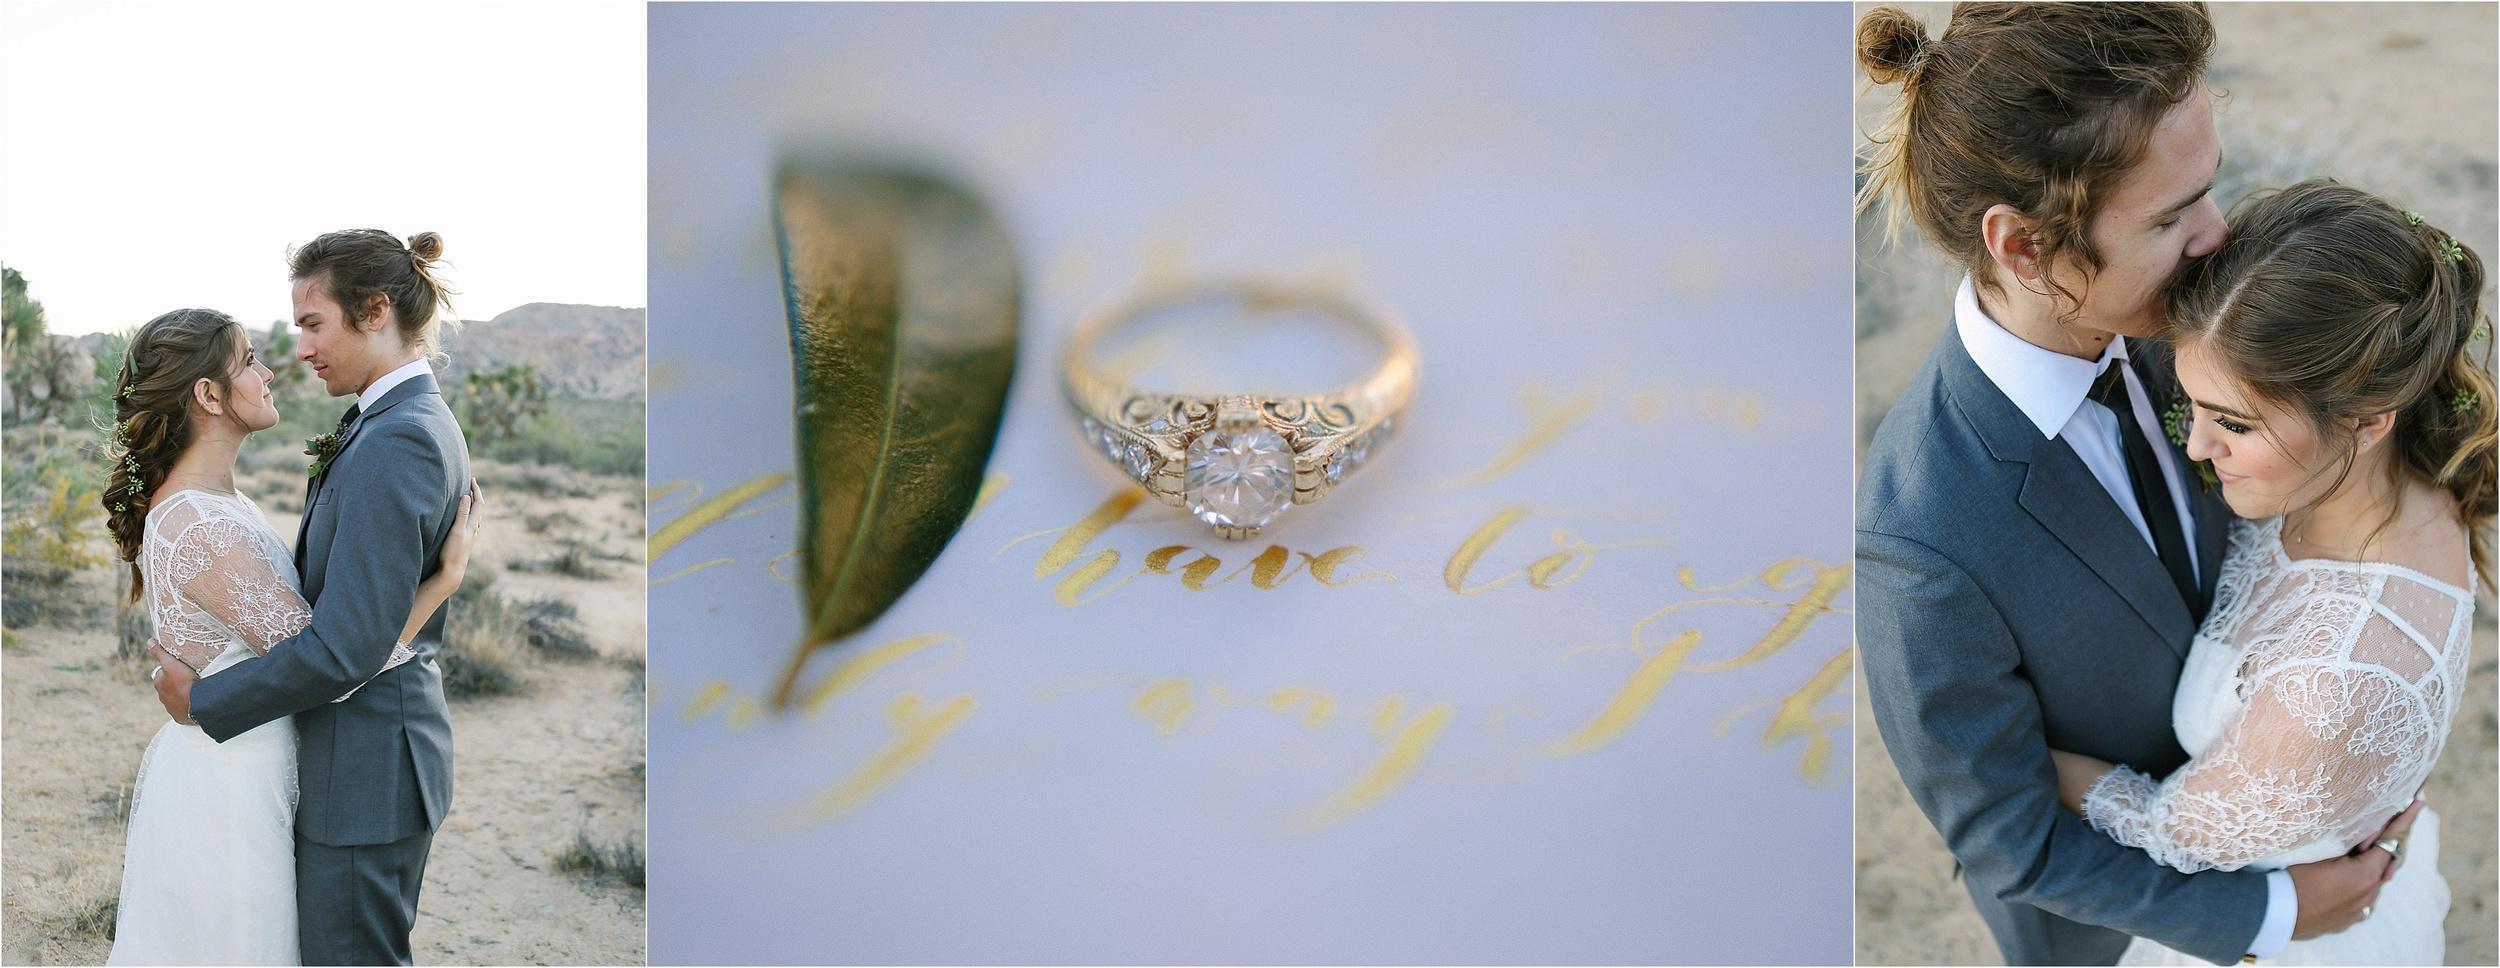 JoshuaTree, CA-TiffanyJPhotography_10.jpg